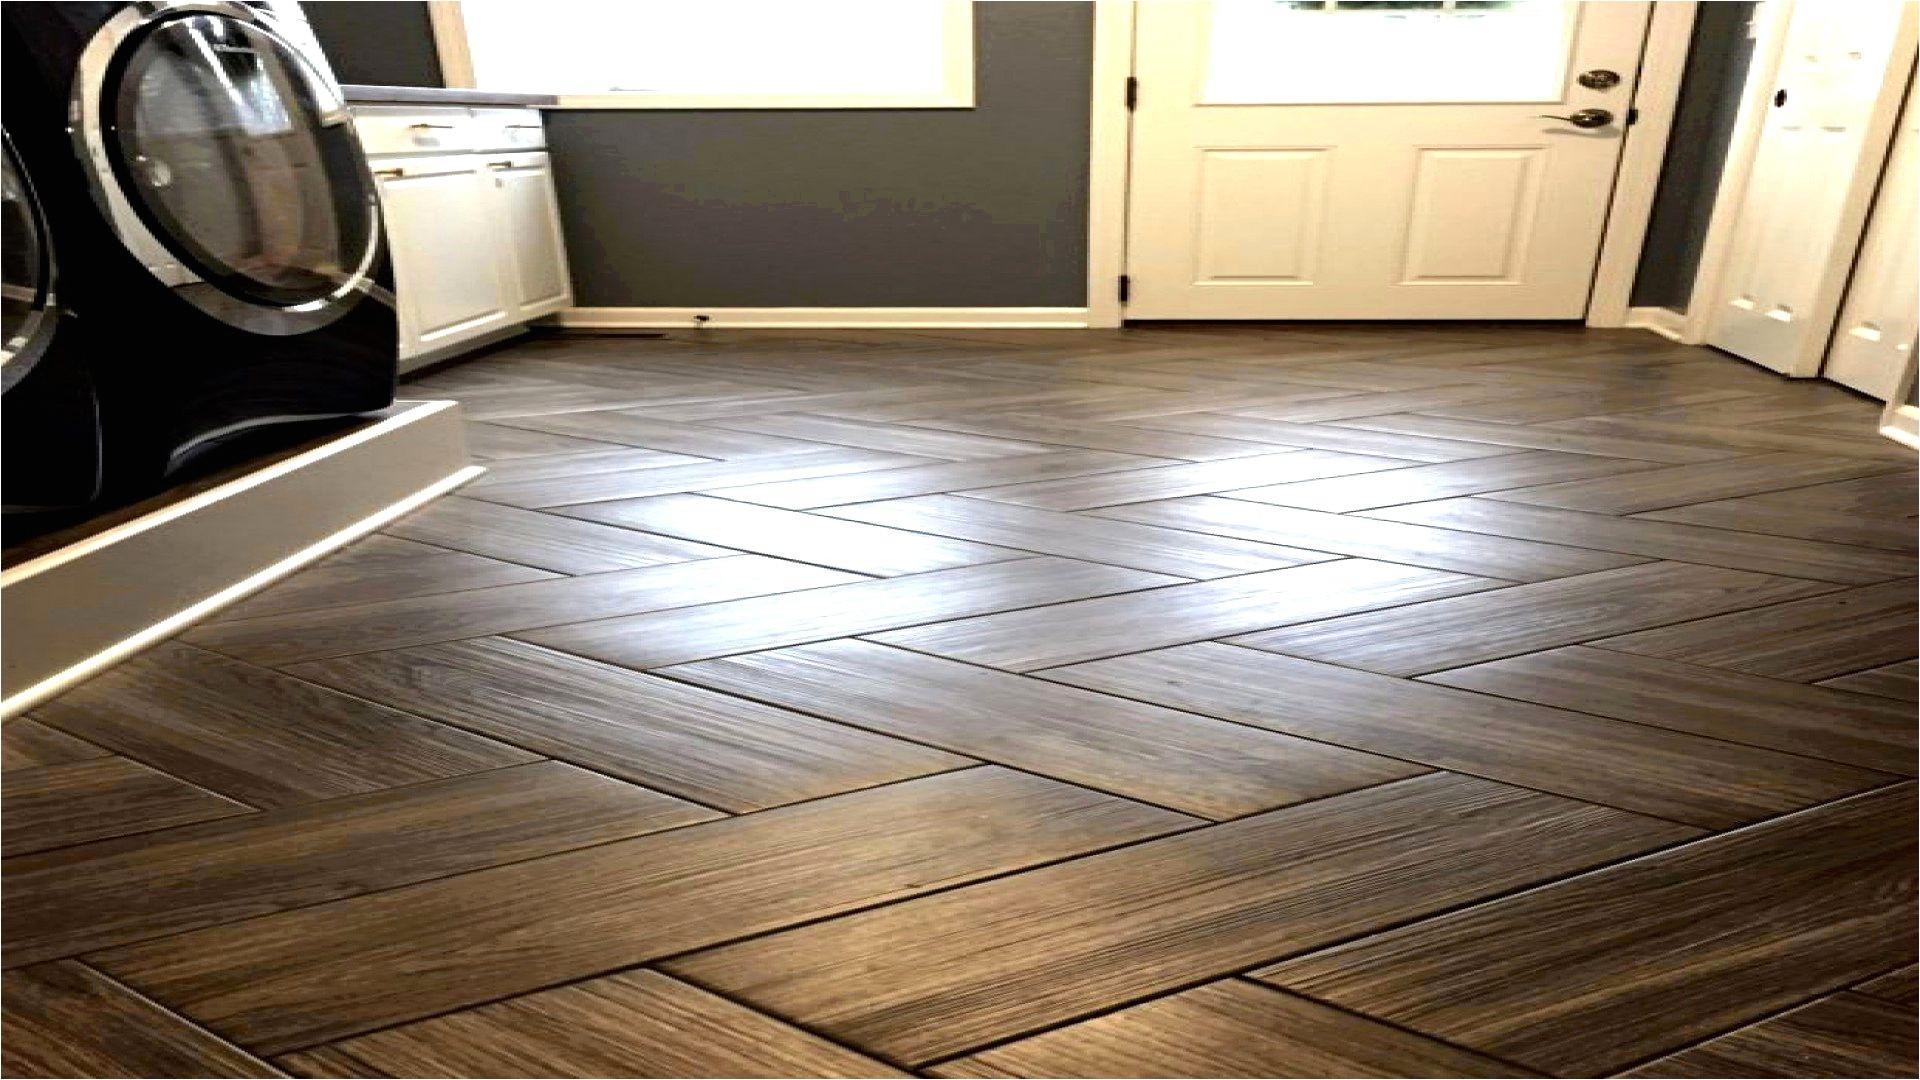 hardwood floor to tile reducer of vinyl plank flooring installation bathroom bradshomefurnishings regarding 40 how to remove vinyl floor tile inspiration